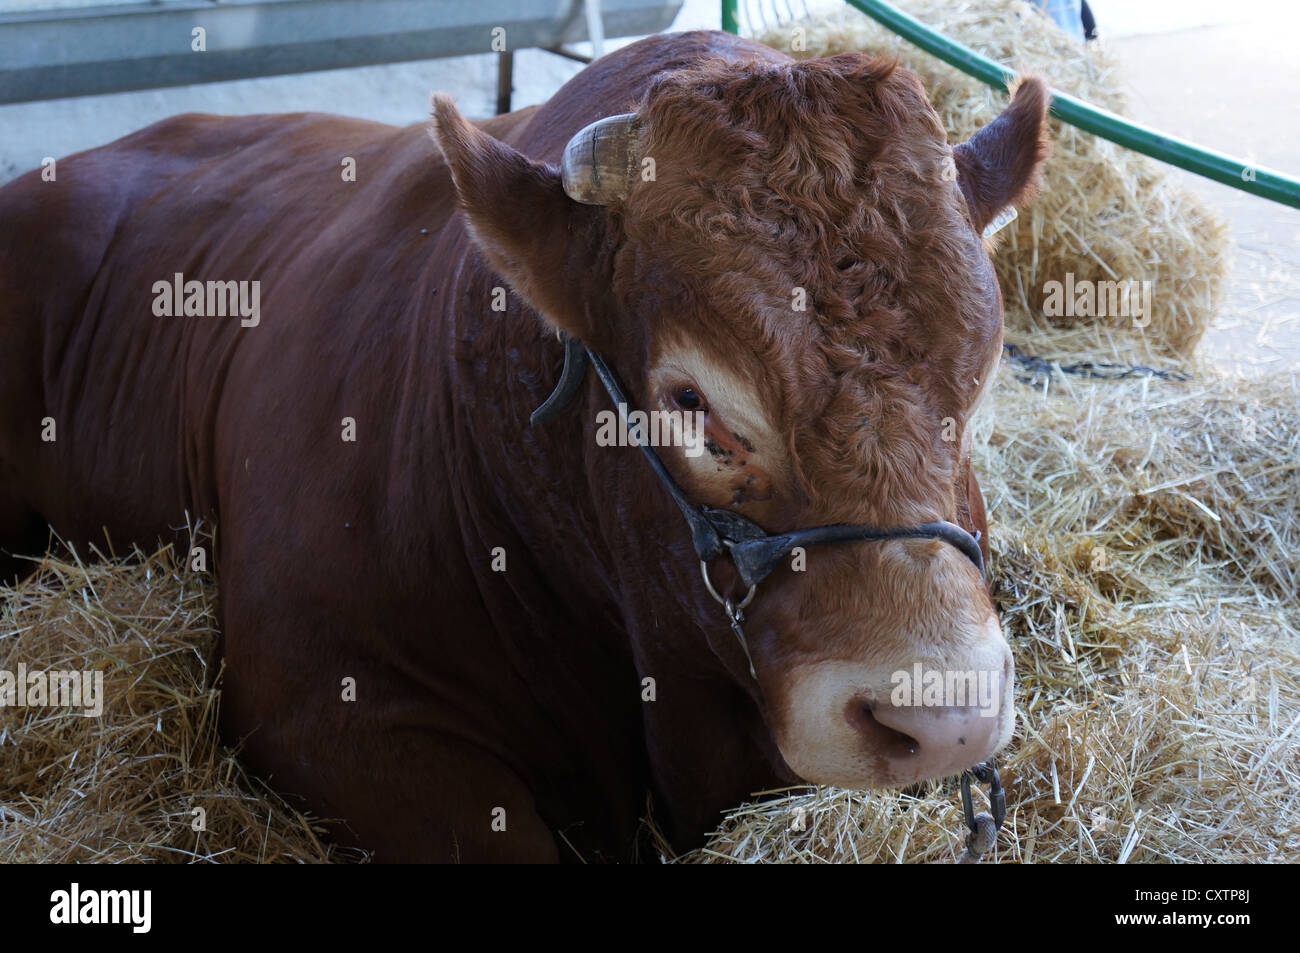 The Zafra Cattle (Feria Internacional Ganadera) Fair at International livestock fair at Zafra, Badajoz, Spain - Stock Image